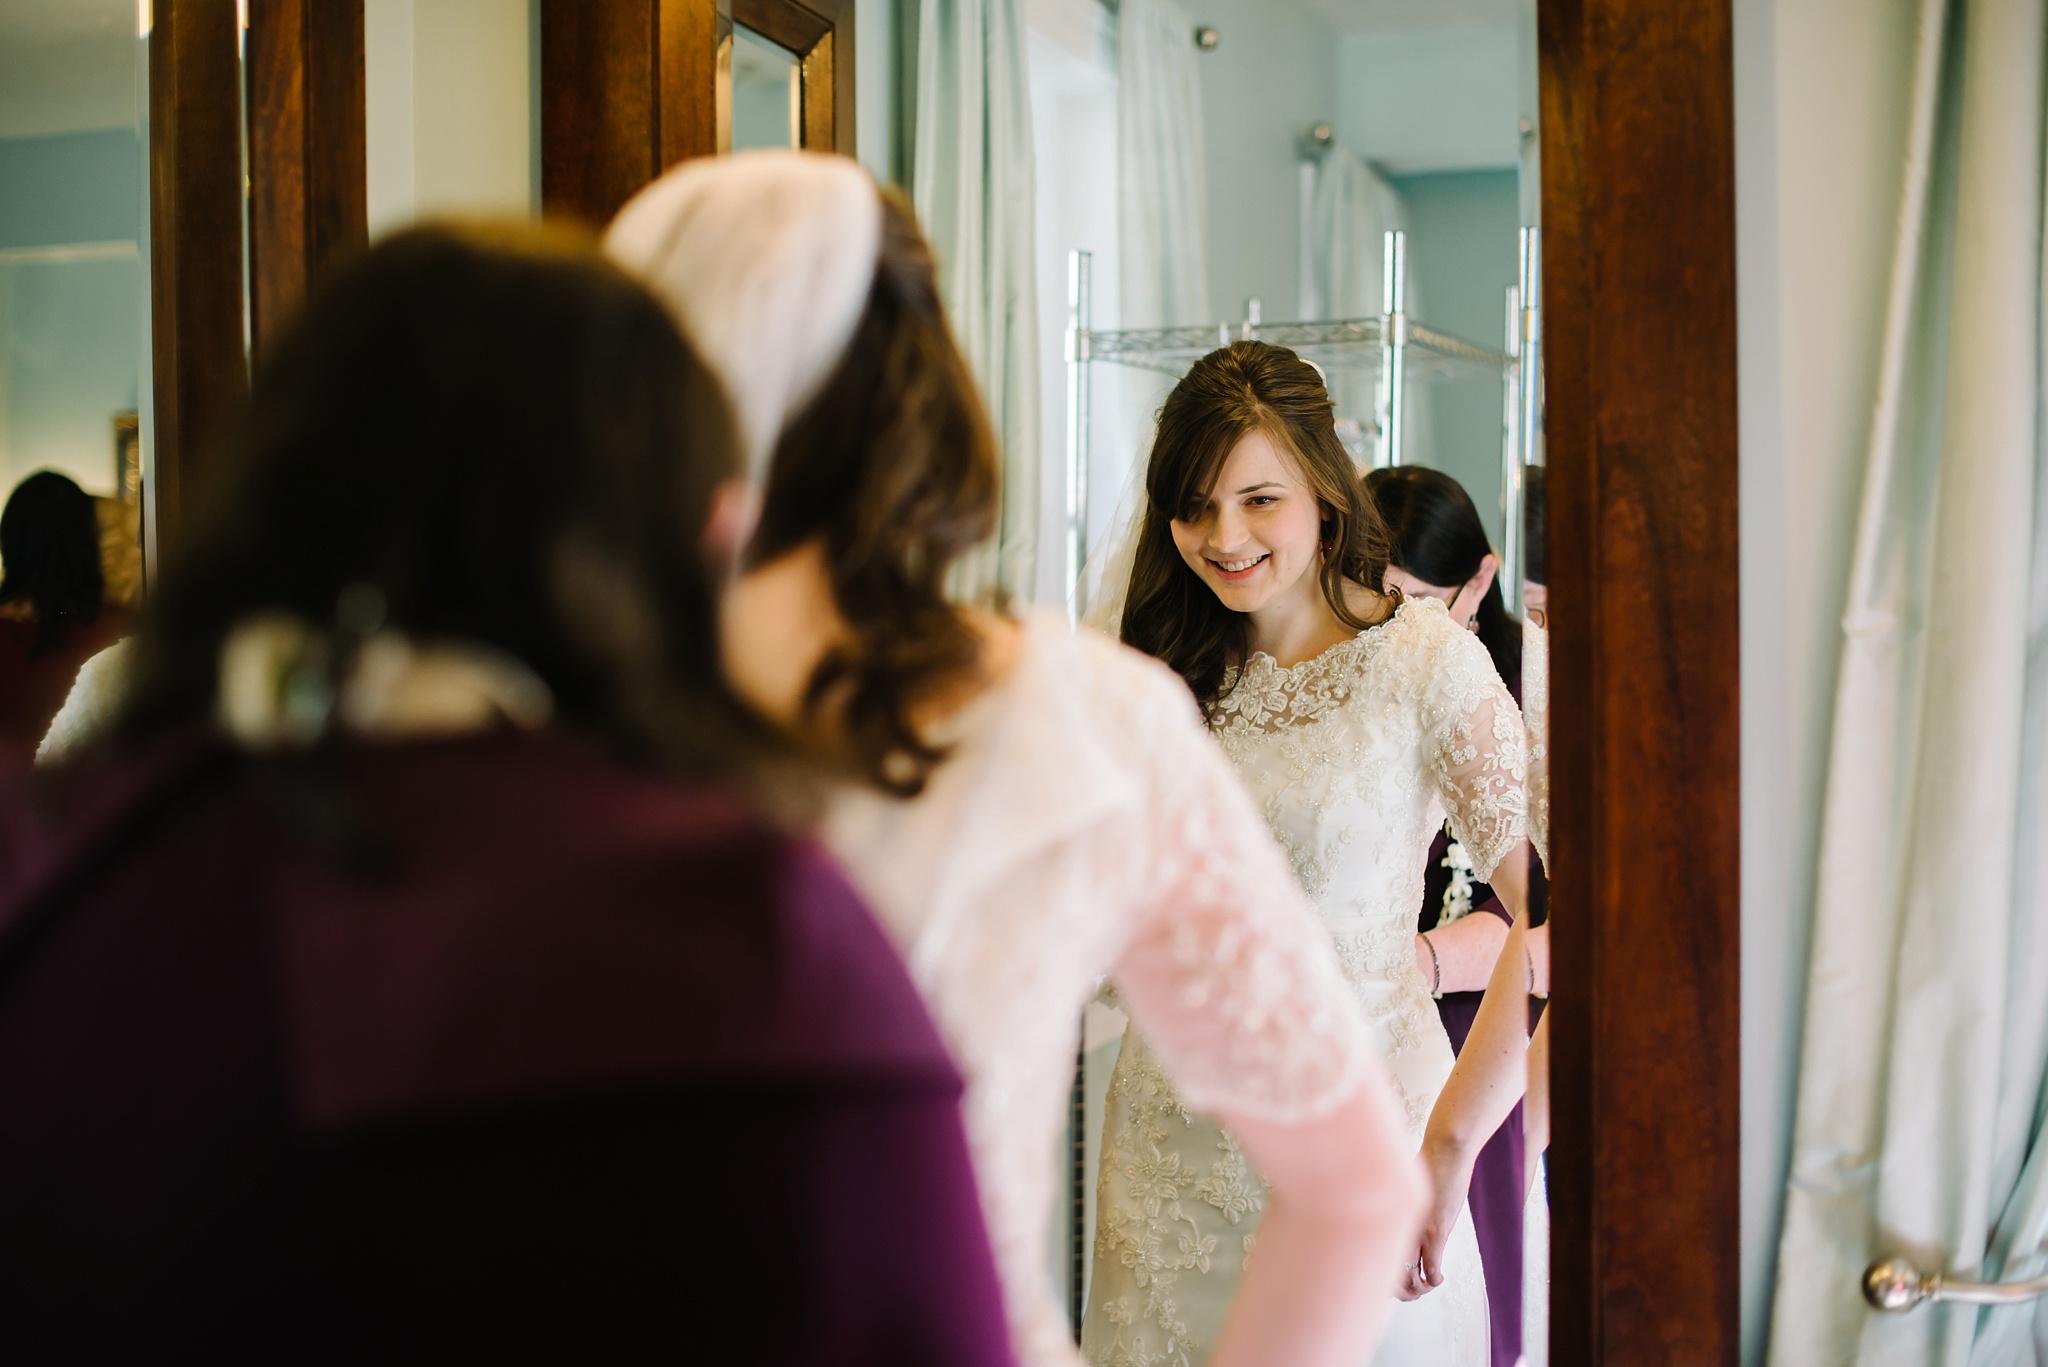 Park City Wedding Photographer Ali Sumsion 010